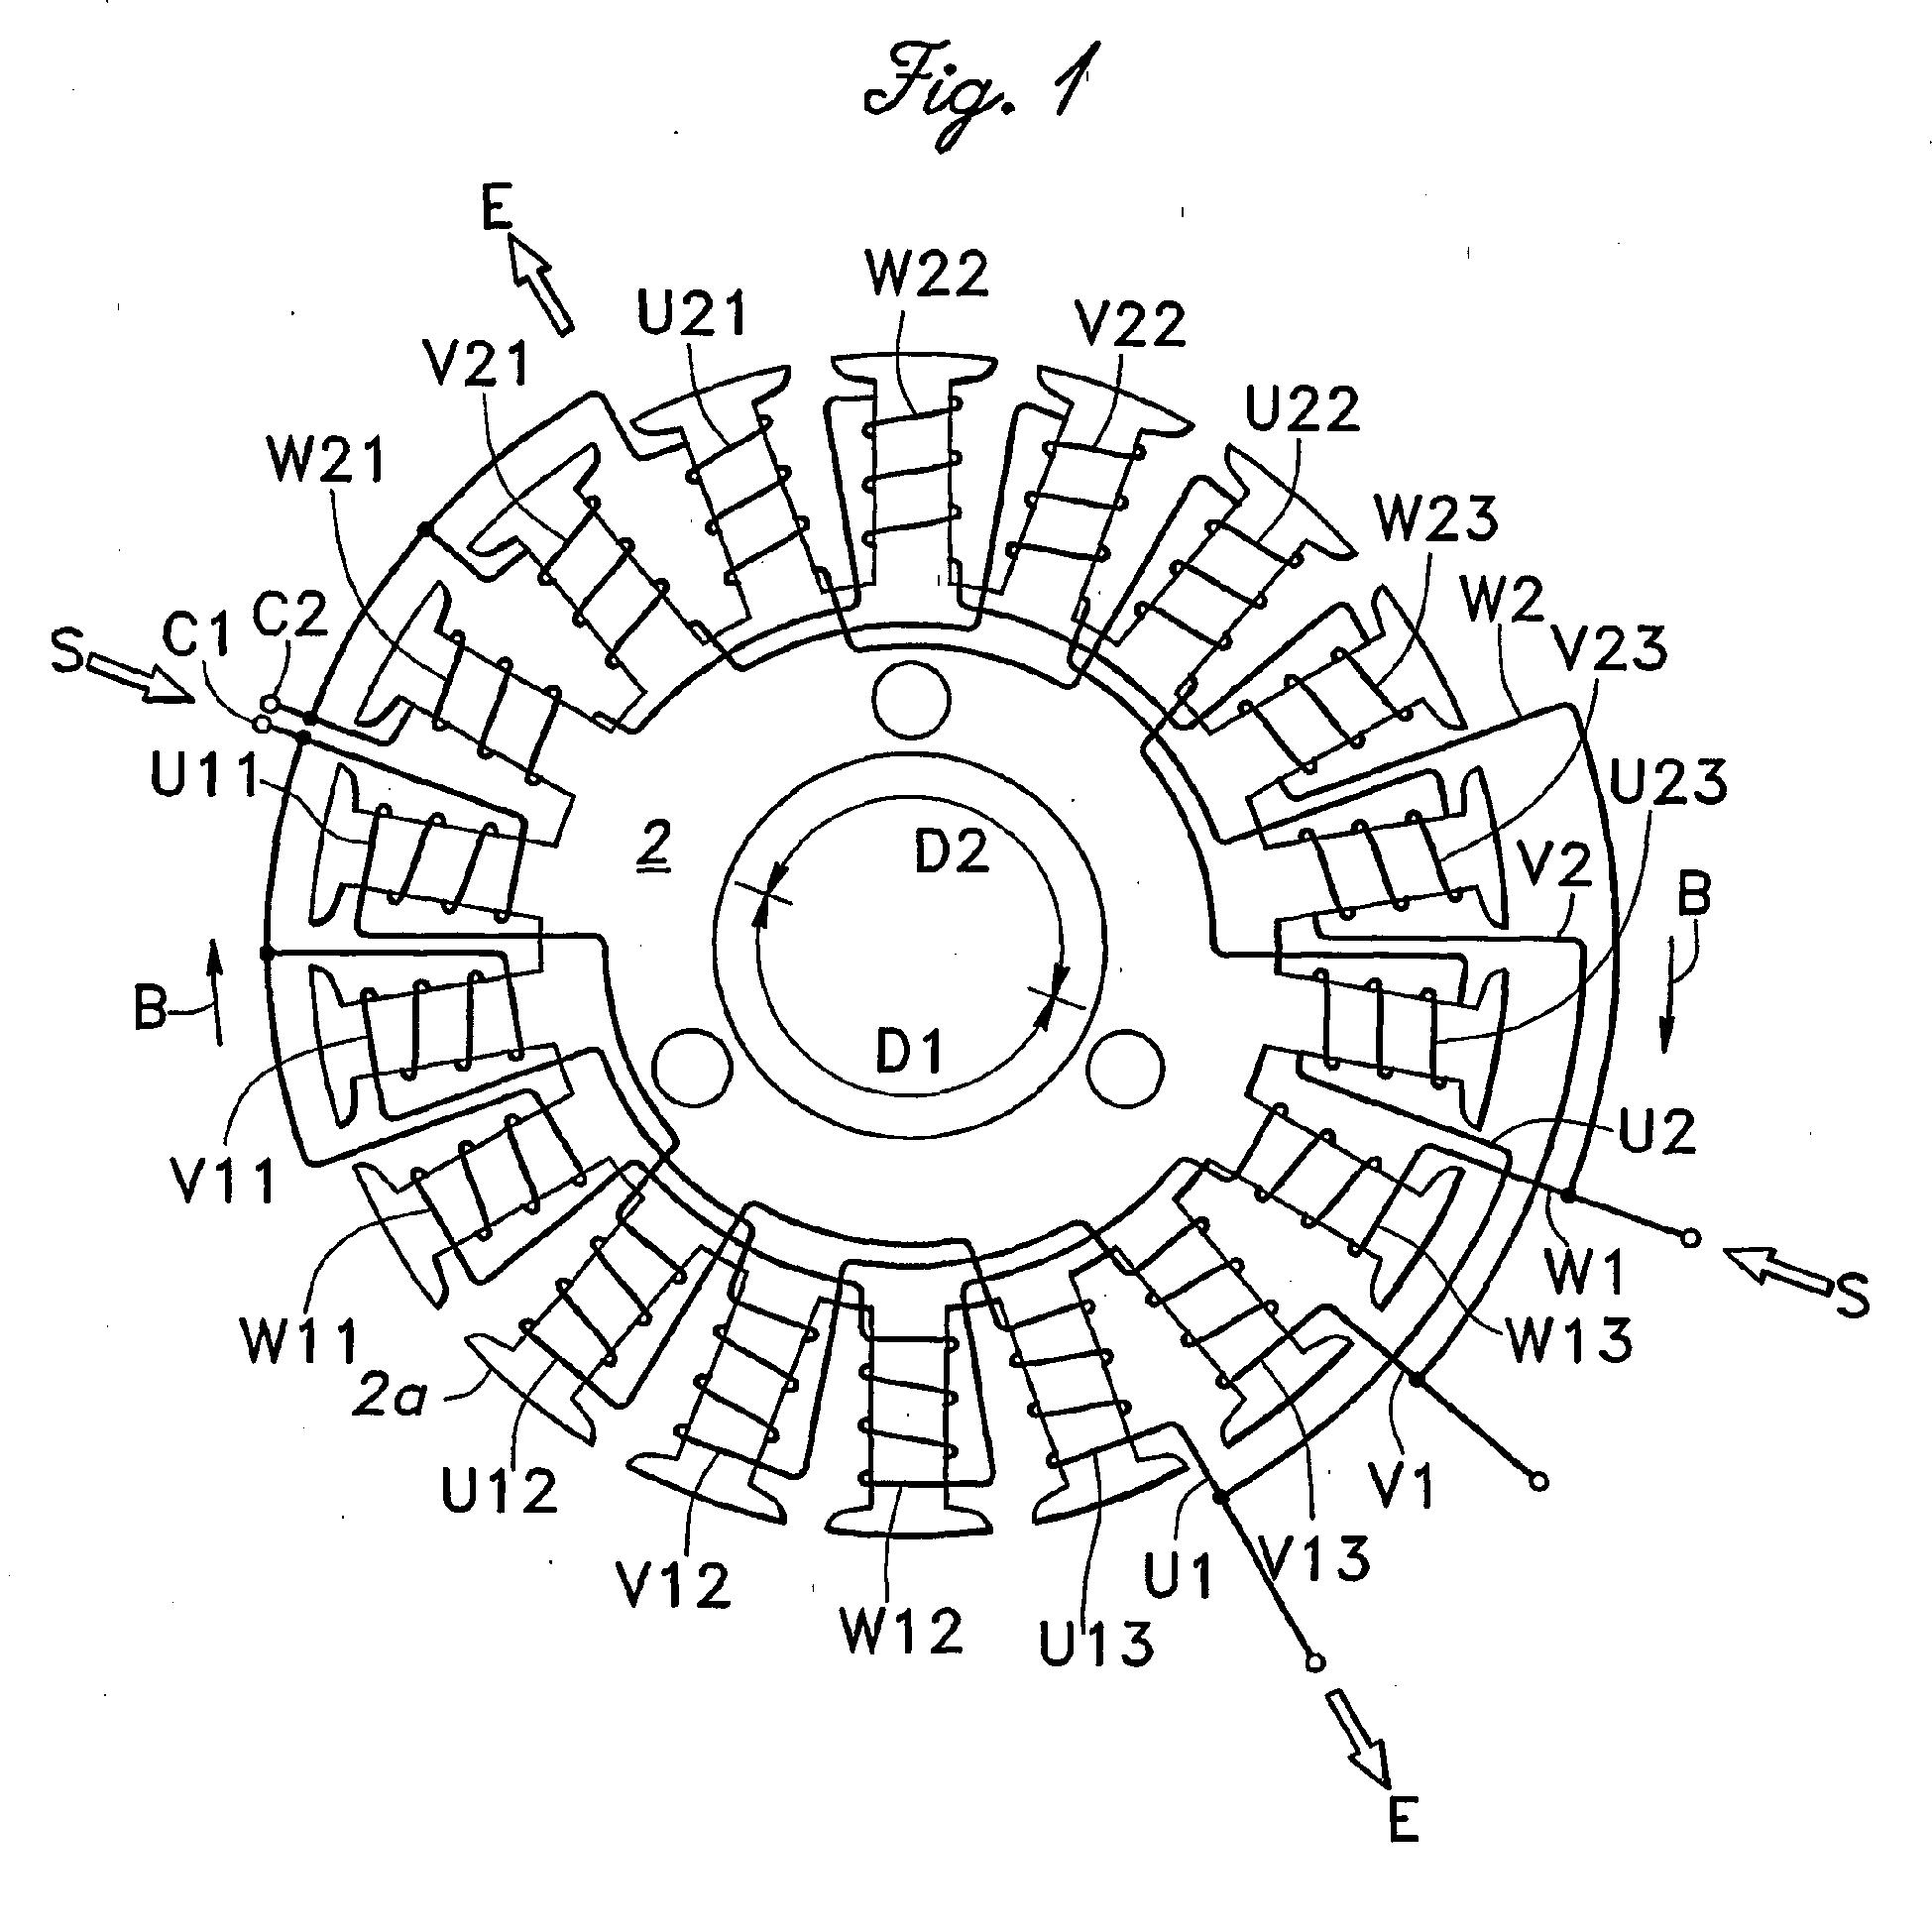 Ge Shunt Trip Circuit Breaker Wiring Diagram additionally Ge Shunt Trip Breaker Wiring Diagram also 208 Wiring Diagrams additionally  on ge shunt trip wiring diagram